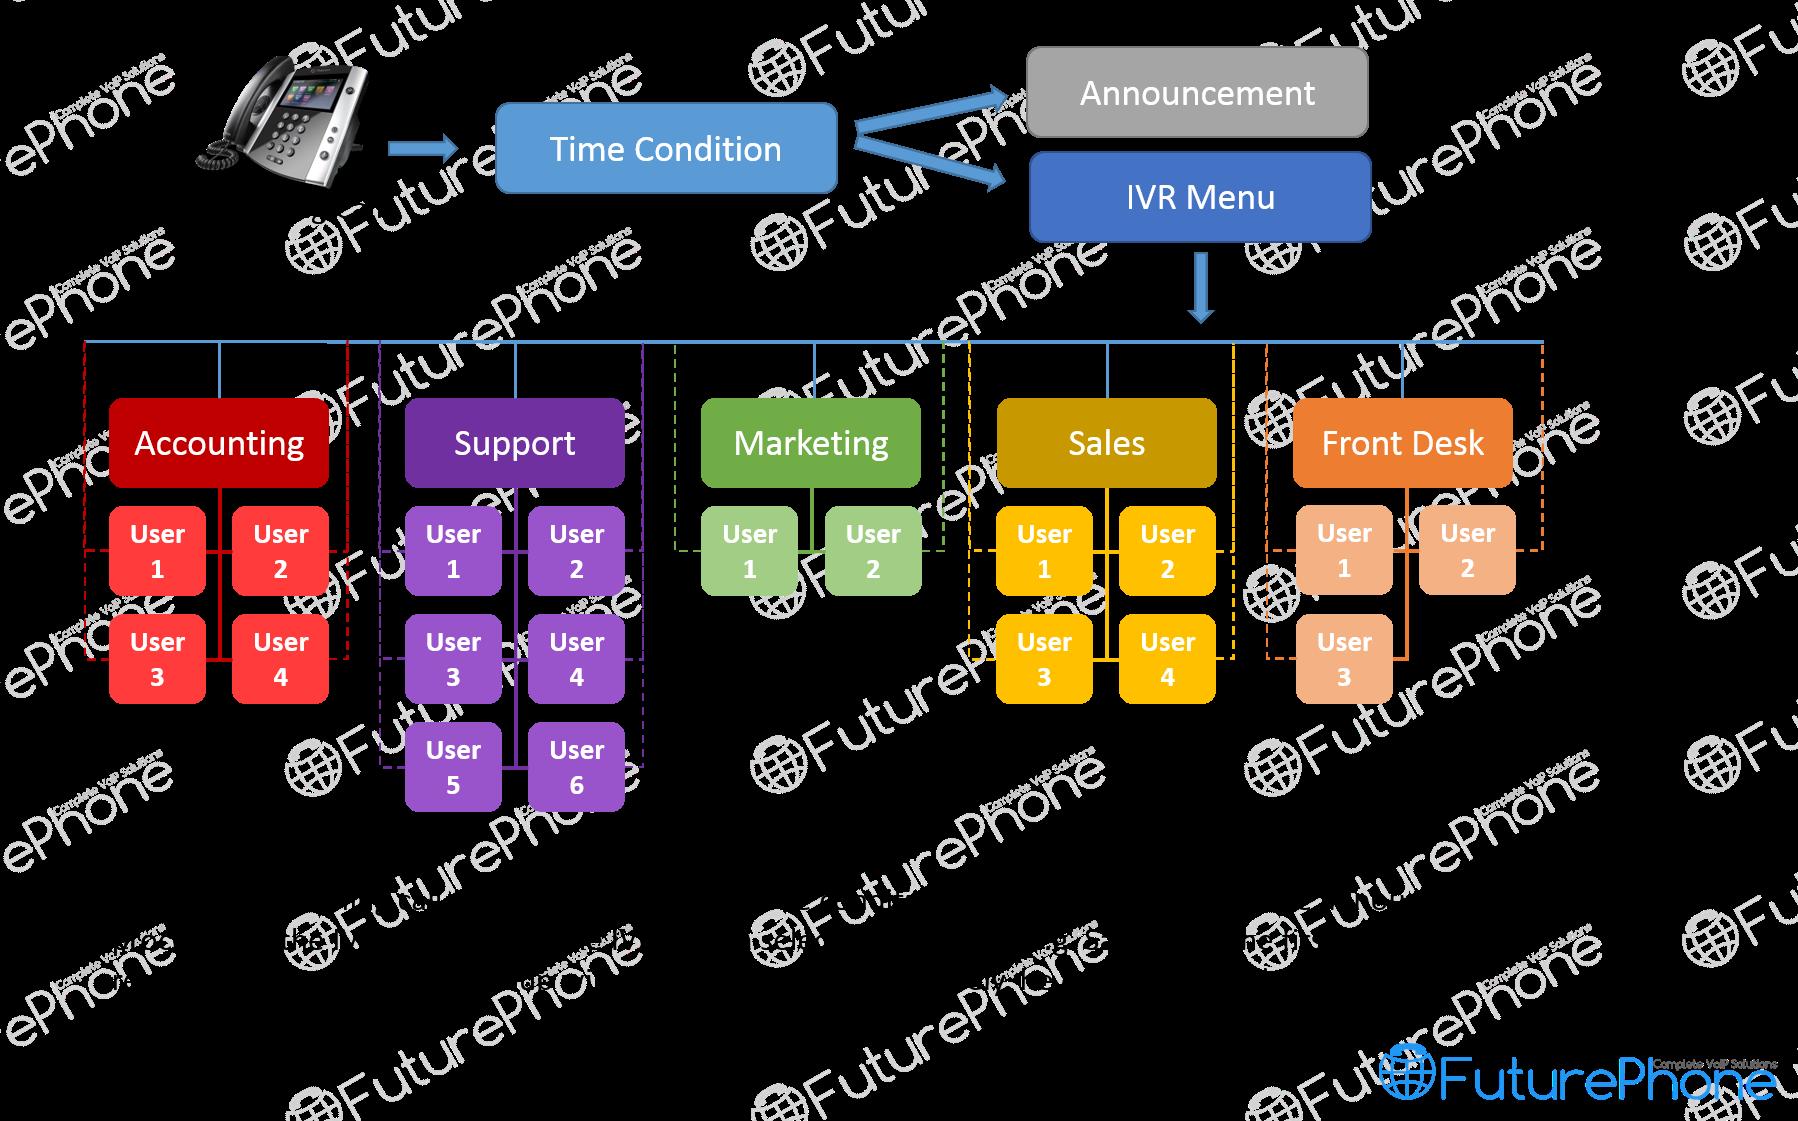 Future-Phone-VPBX-Example